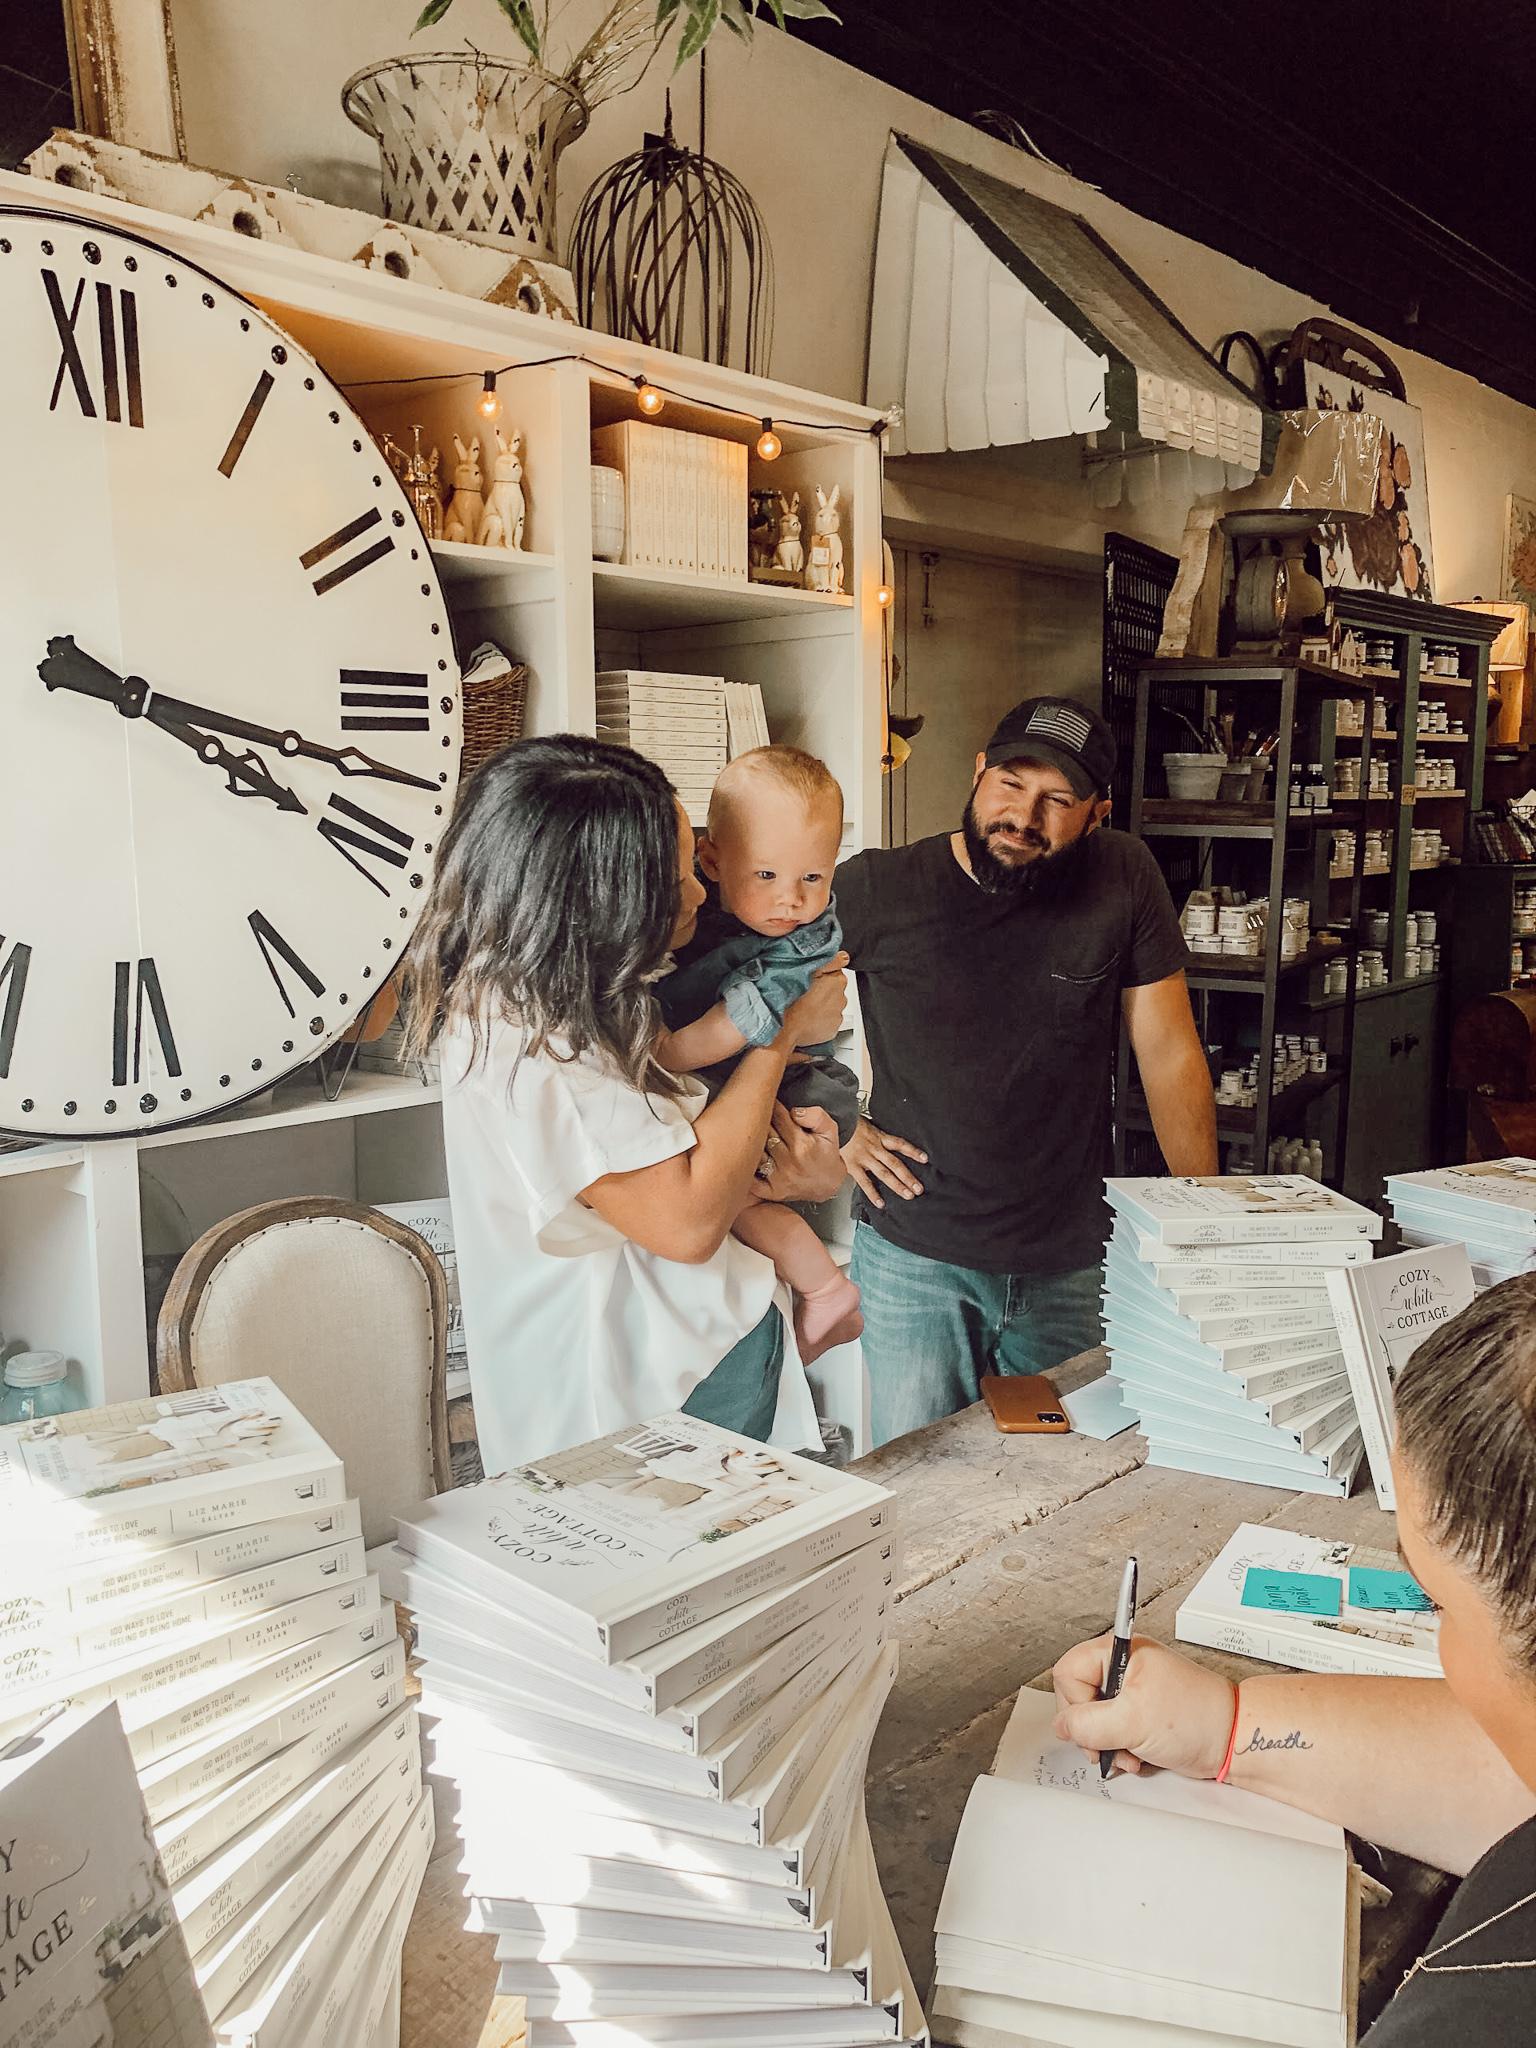 Book Signing, Recap: My First Book Signing